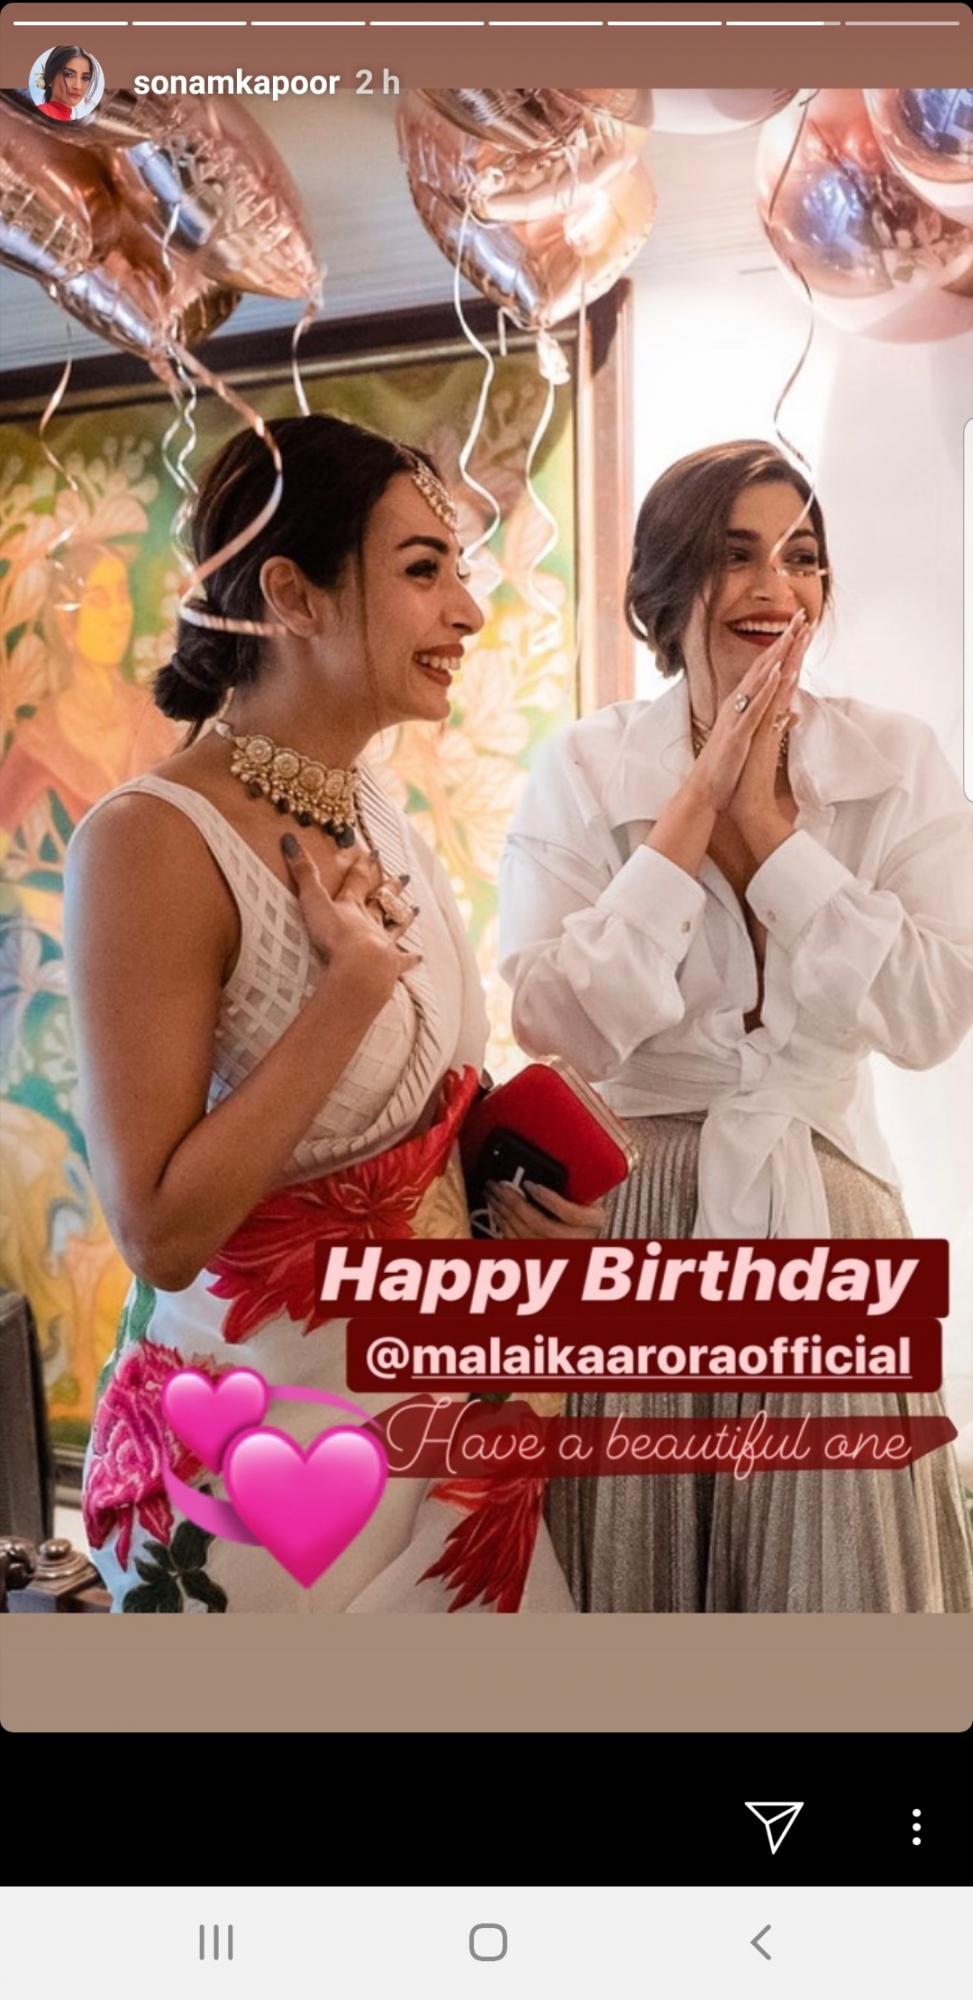 Sonam Kapoor Wishes Malaika Arora a Happy Birthday